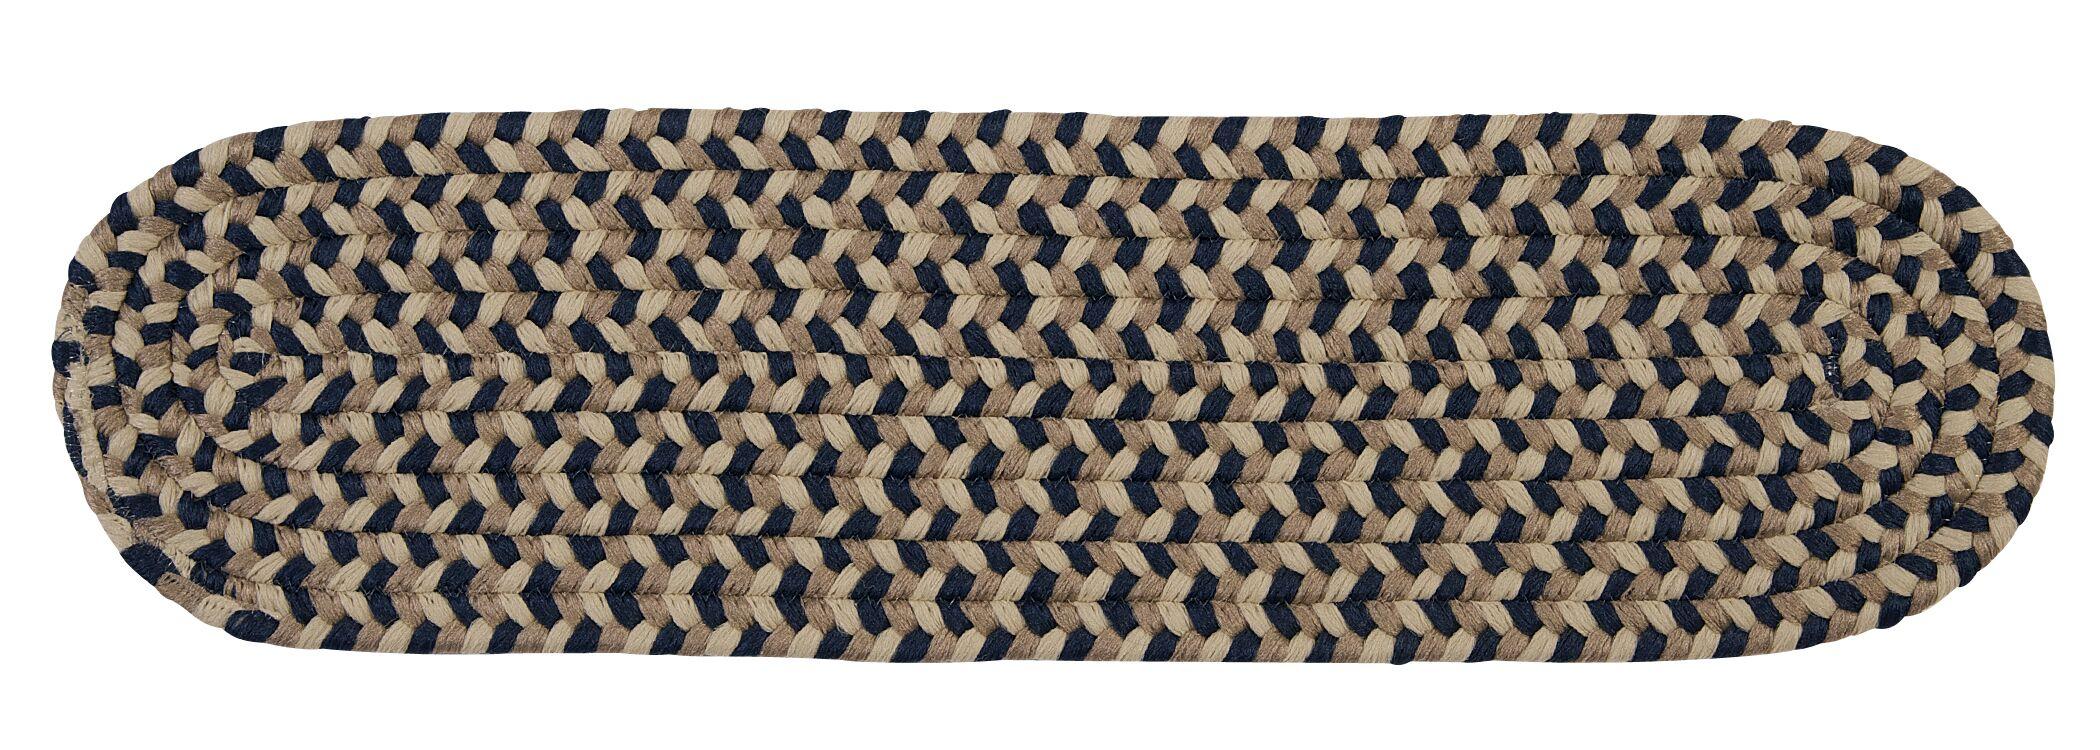 Burmingham Blue Crest Stair Tread Quantity: Set of 13